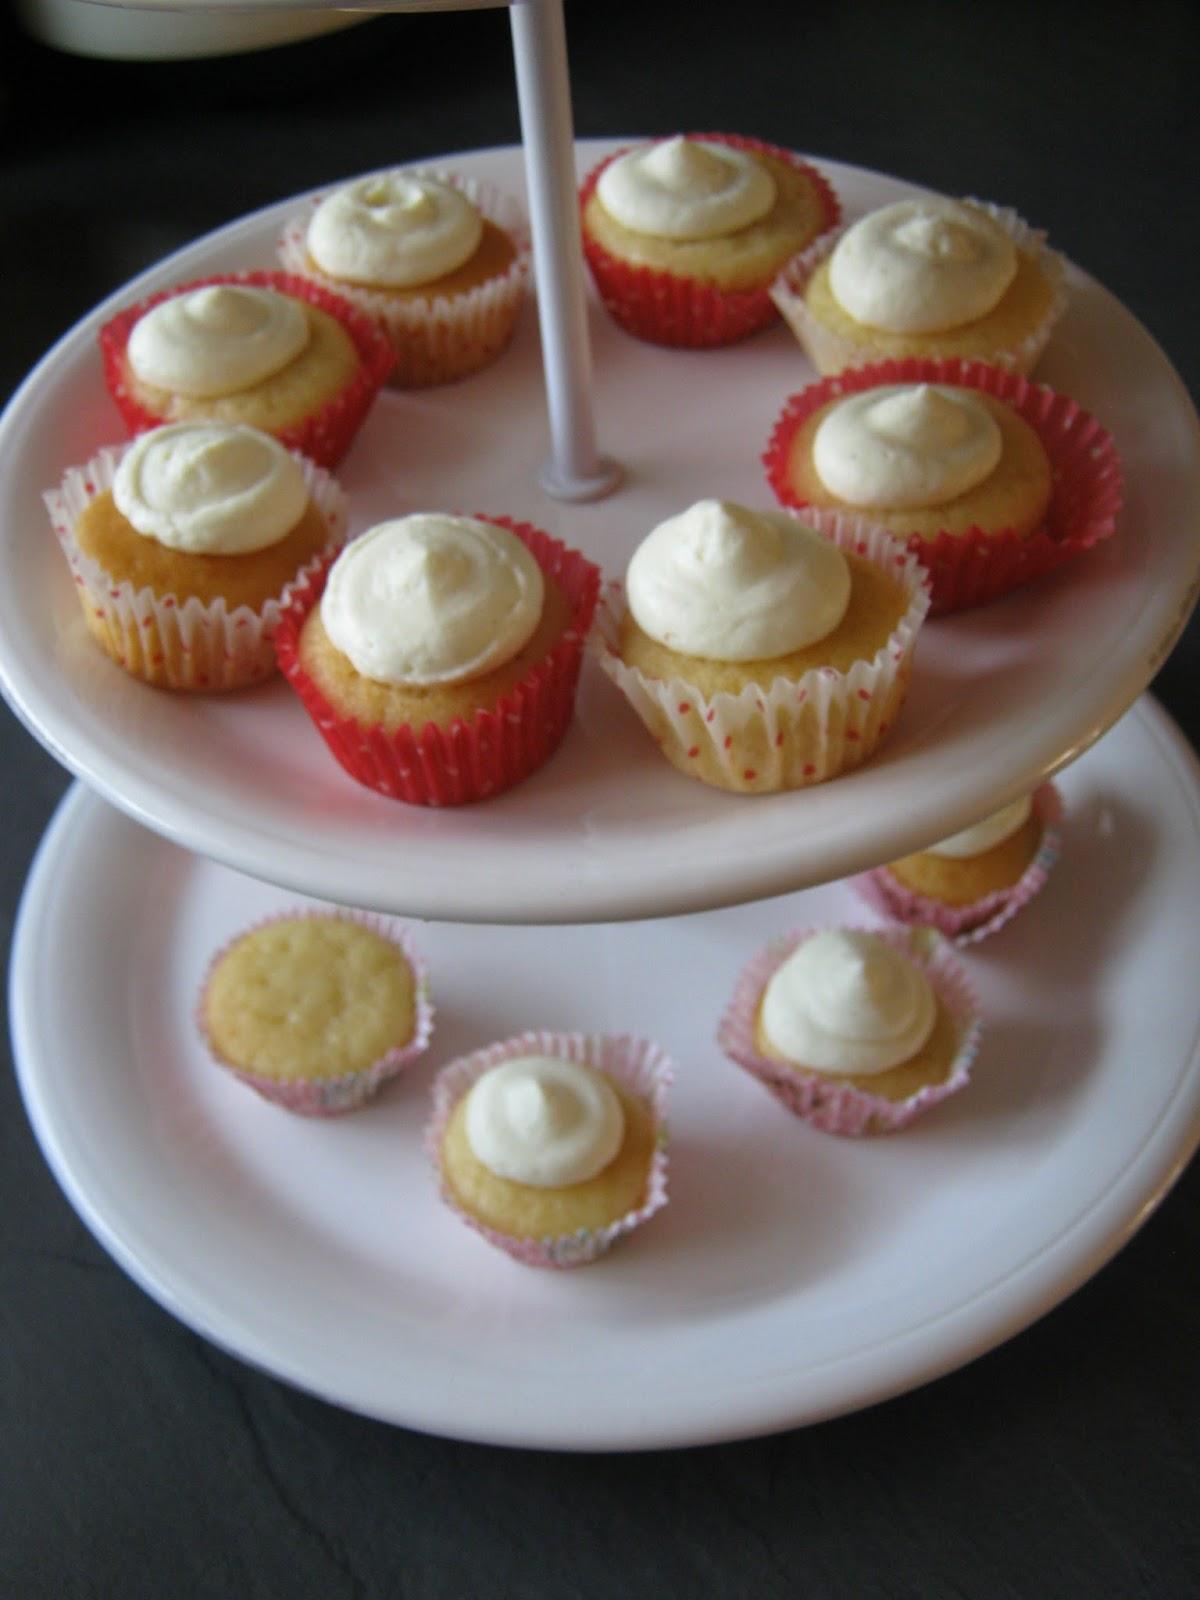 julia 39 s sweet bakery mini cupcakes mit himbeer f llung und wei er ganach. Black Bedroom Furniture Sets. Home Design Ideas